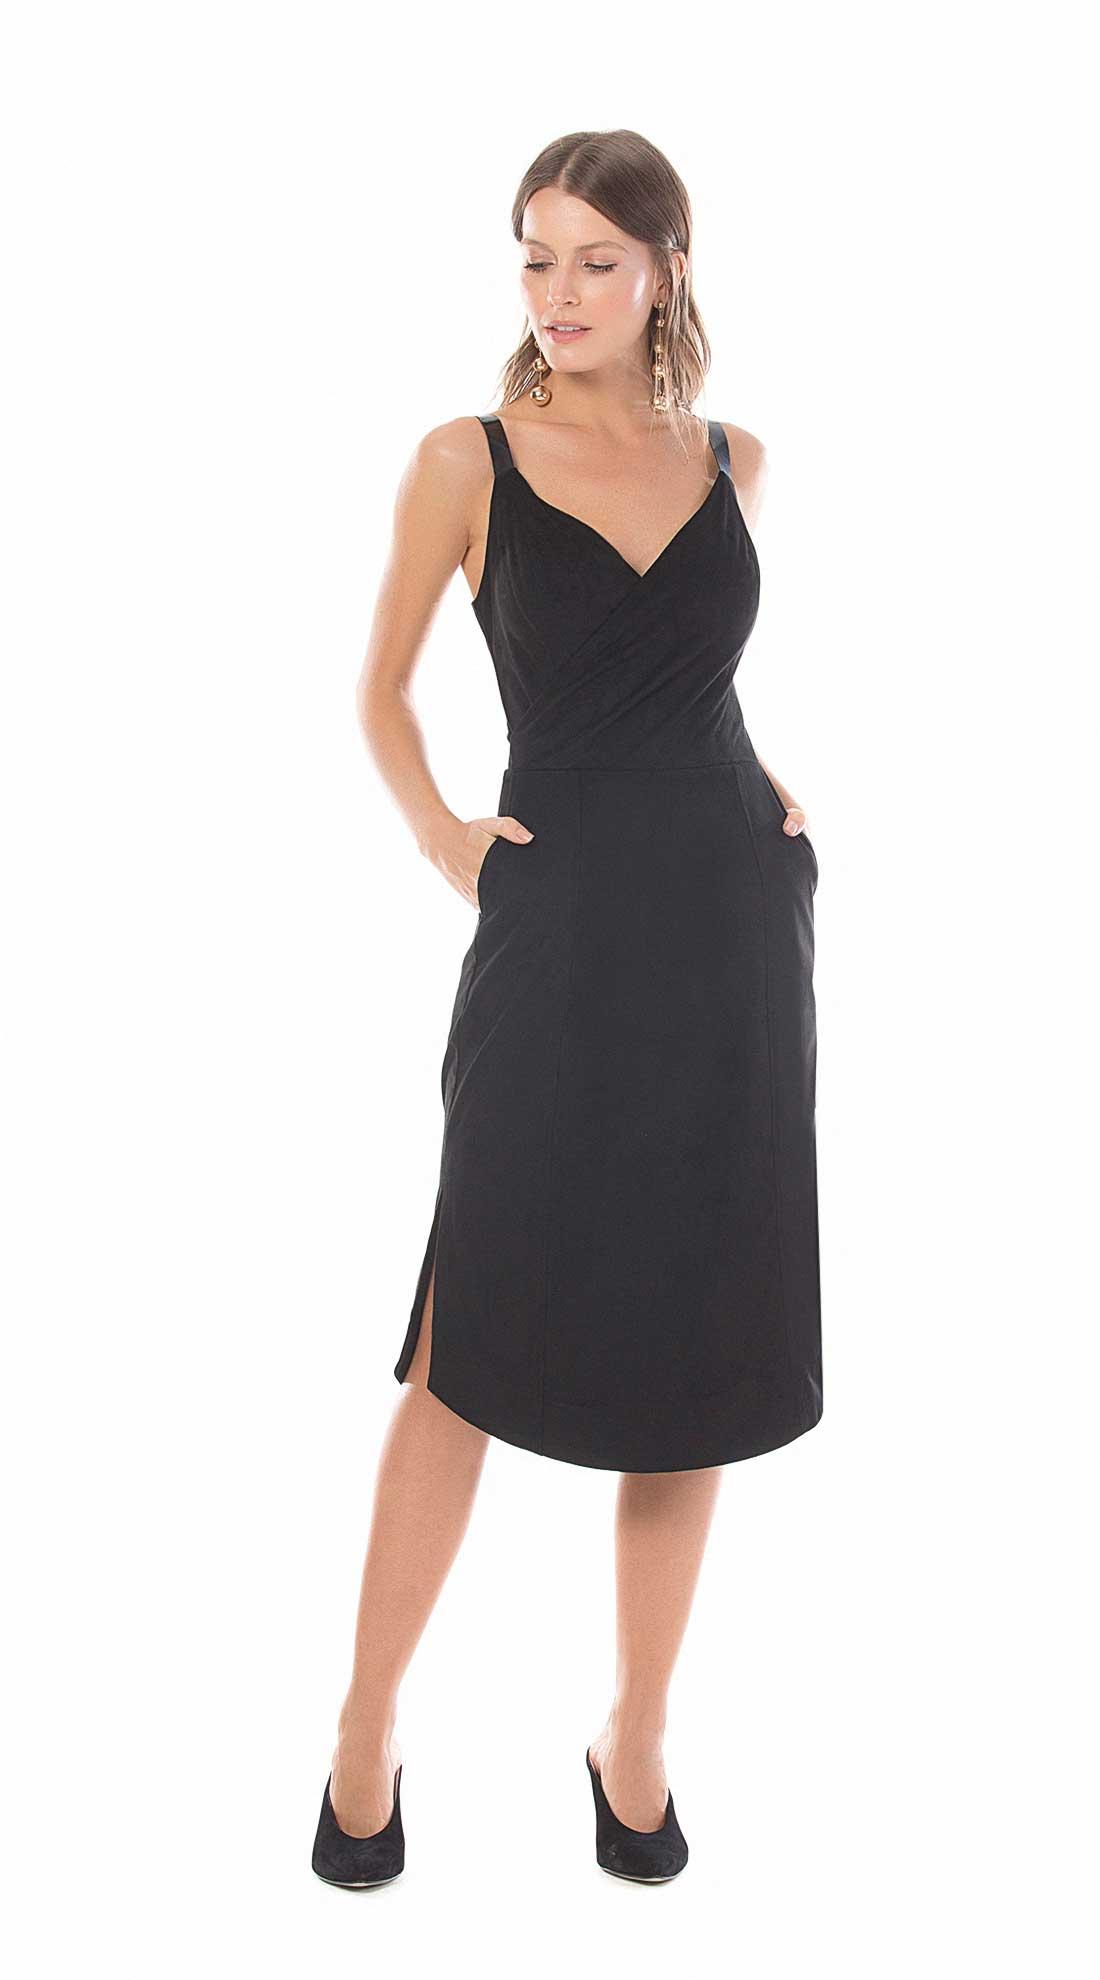 34574405a Vestido Curto Decote V Transpasse Frente Preto - Maria Valentina